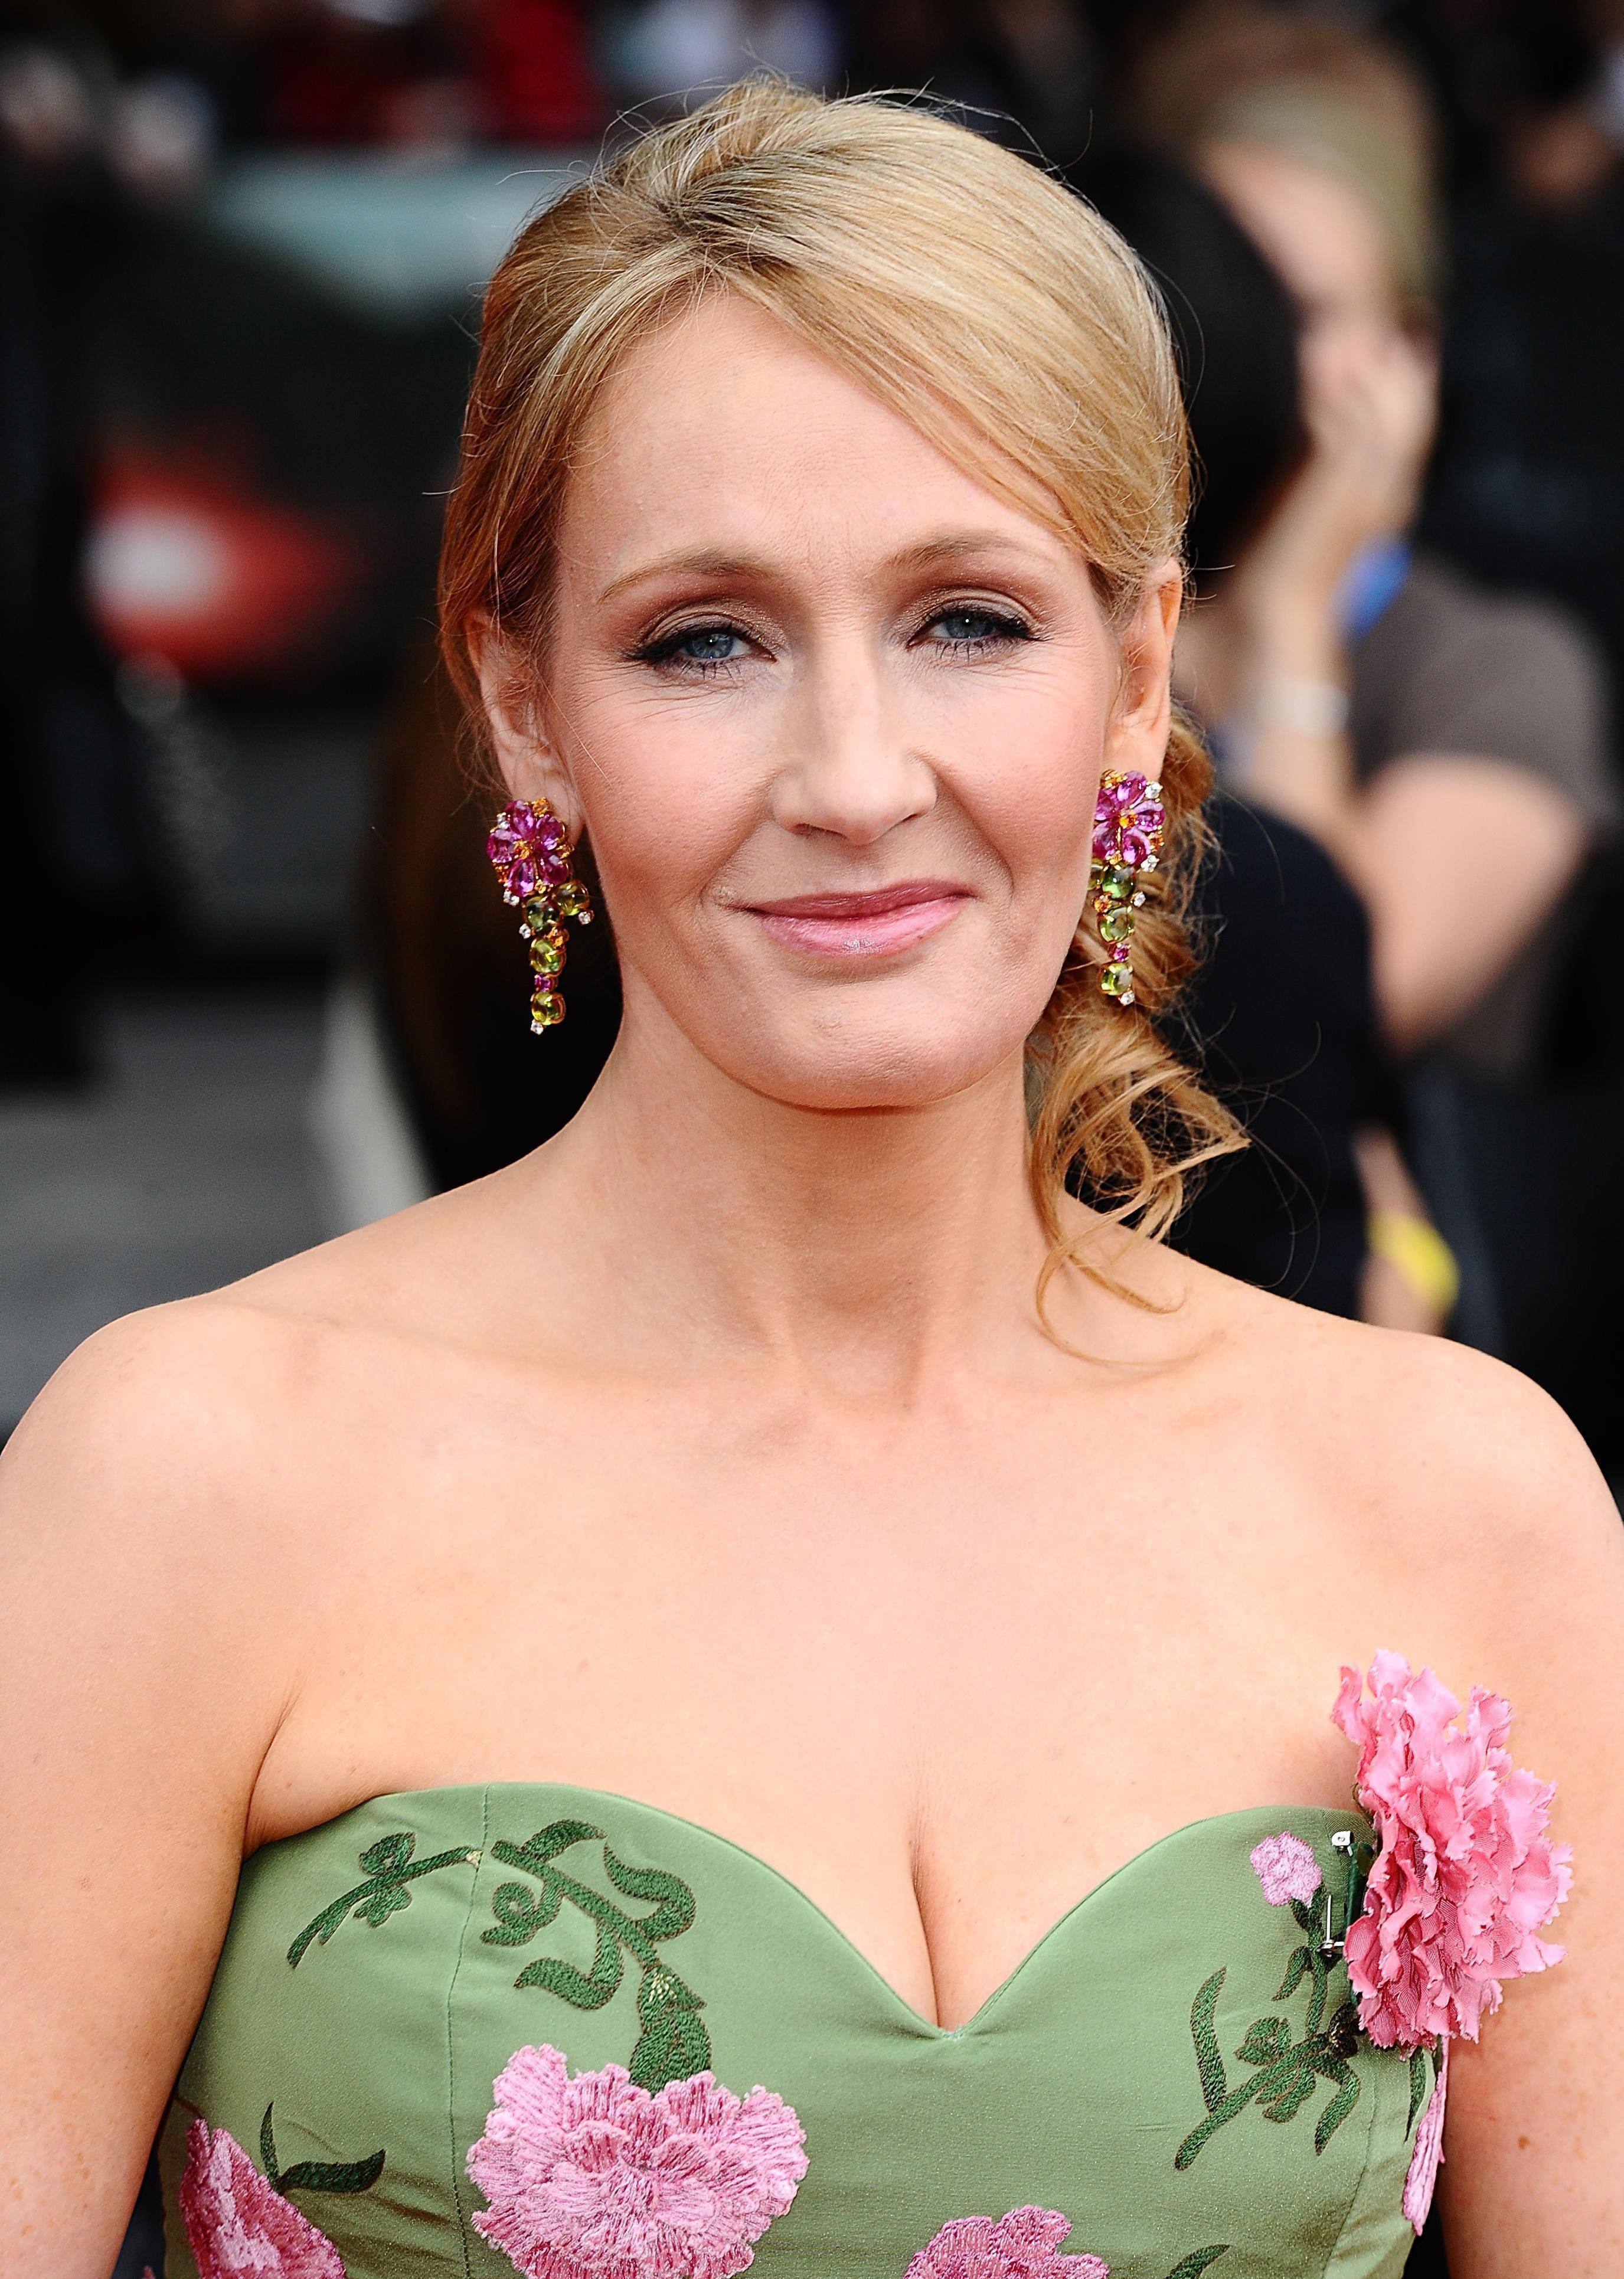 JK Rowling arrives for a film premiere